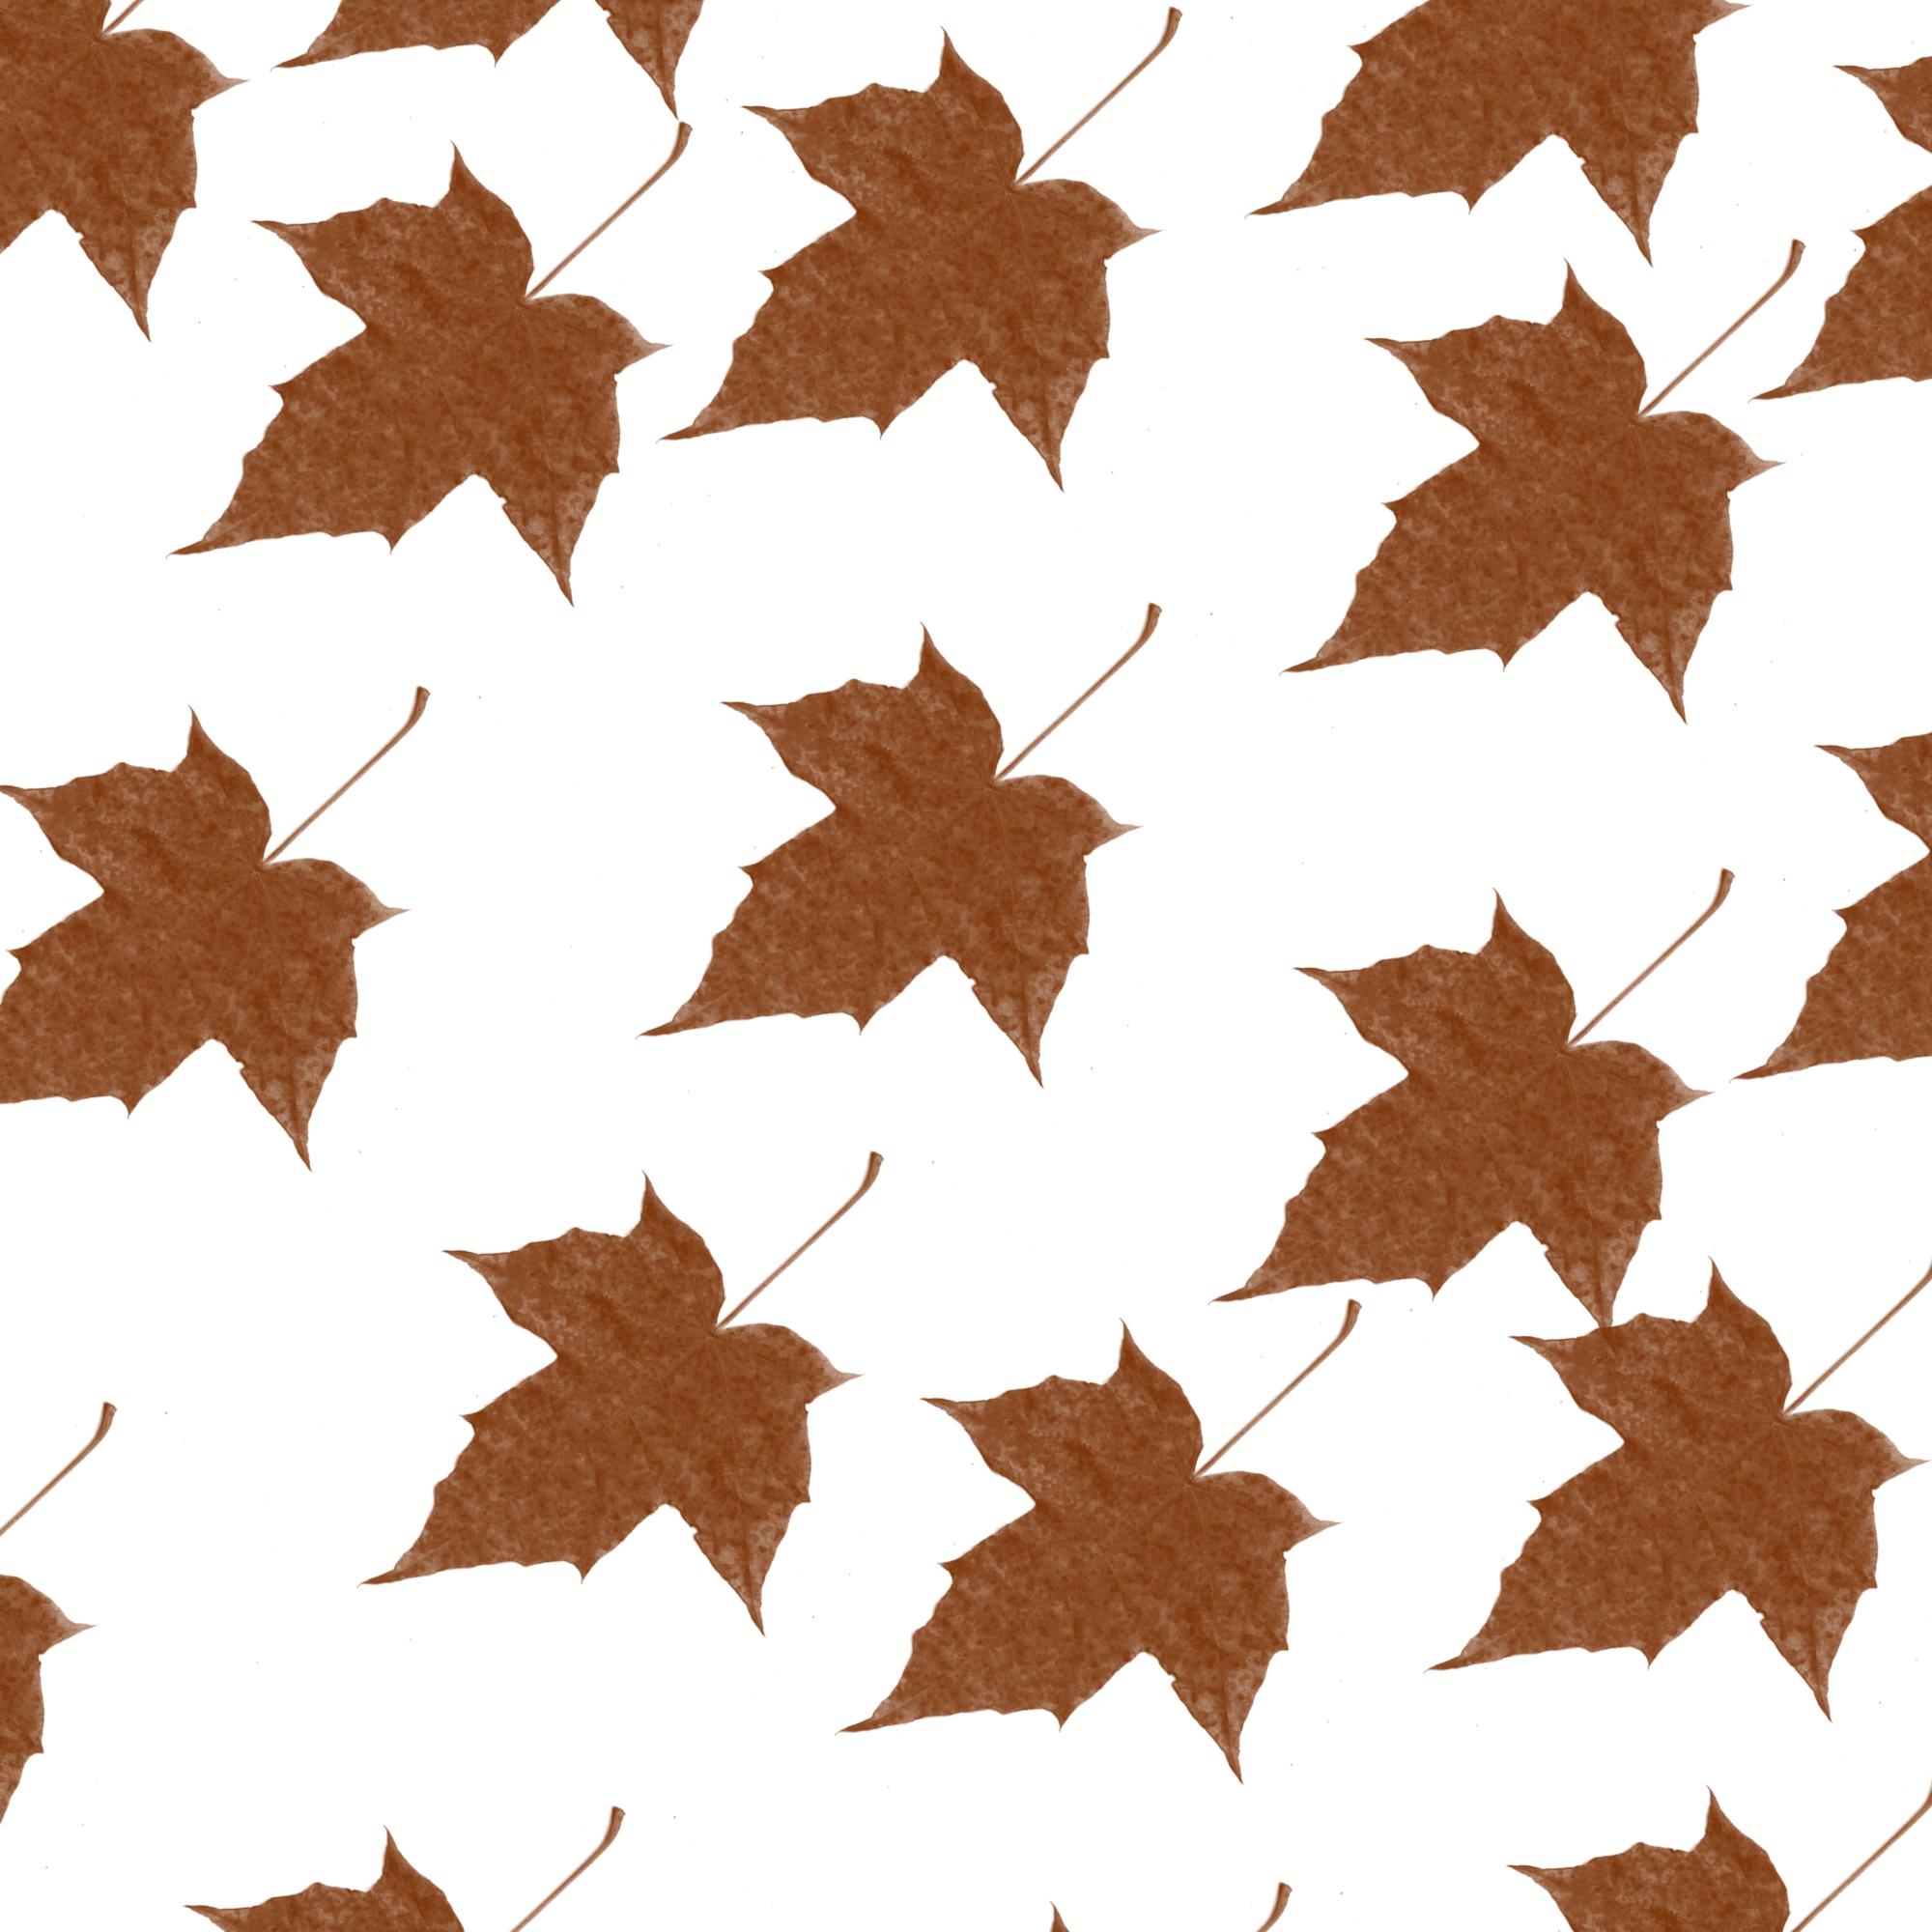 A plant leaves illustration